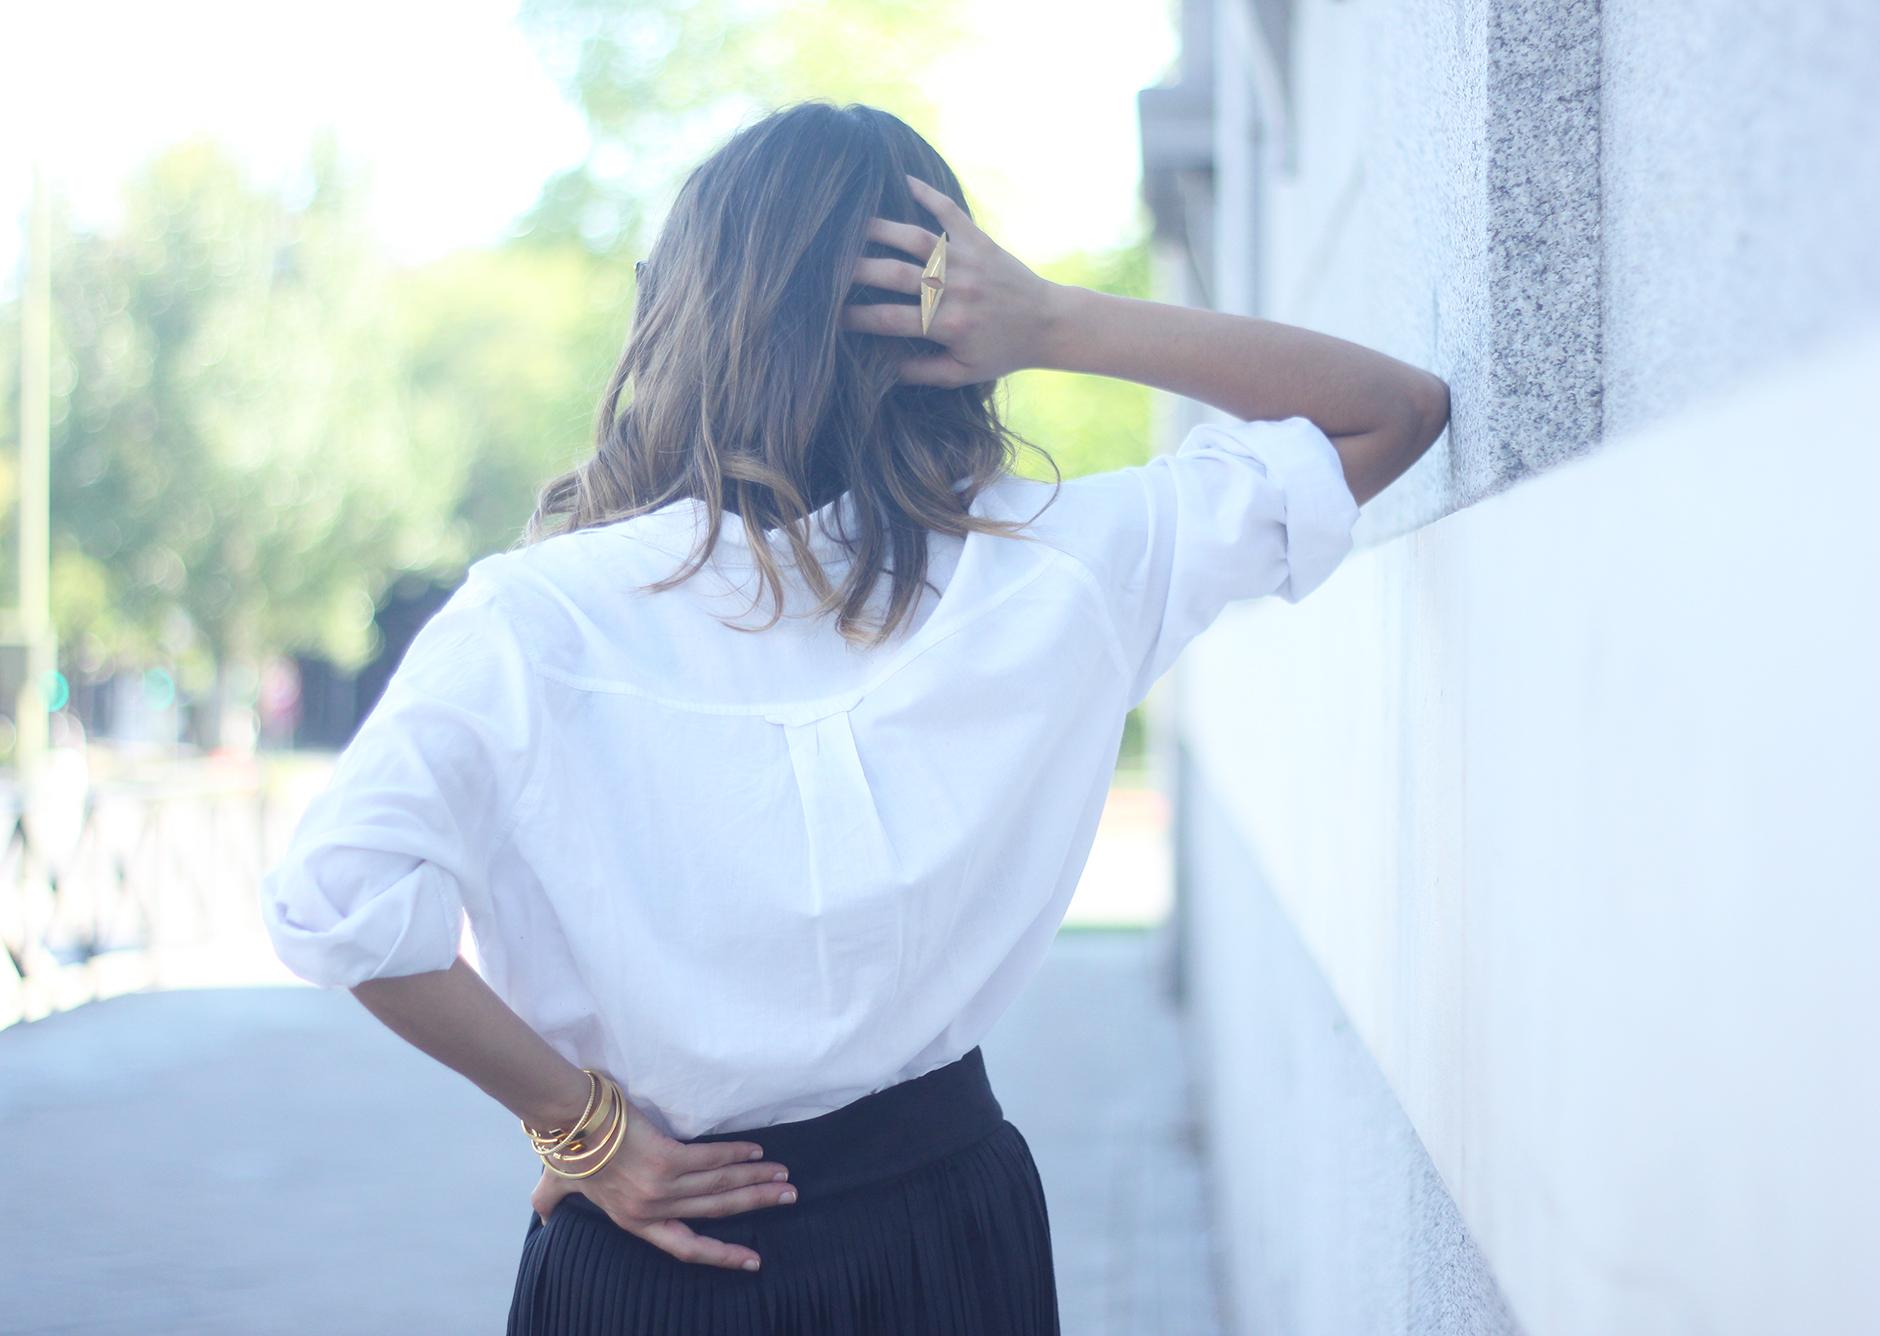 Fringed Black Skirt White Shirt Outfit Carolina Herrera Sandals14